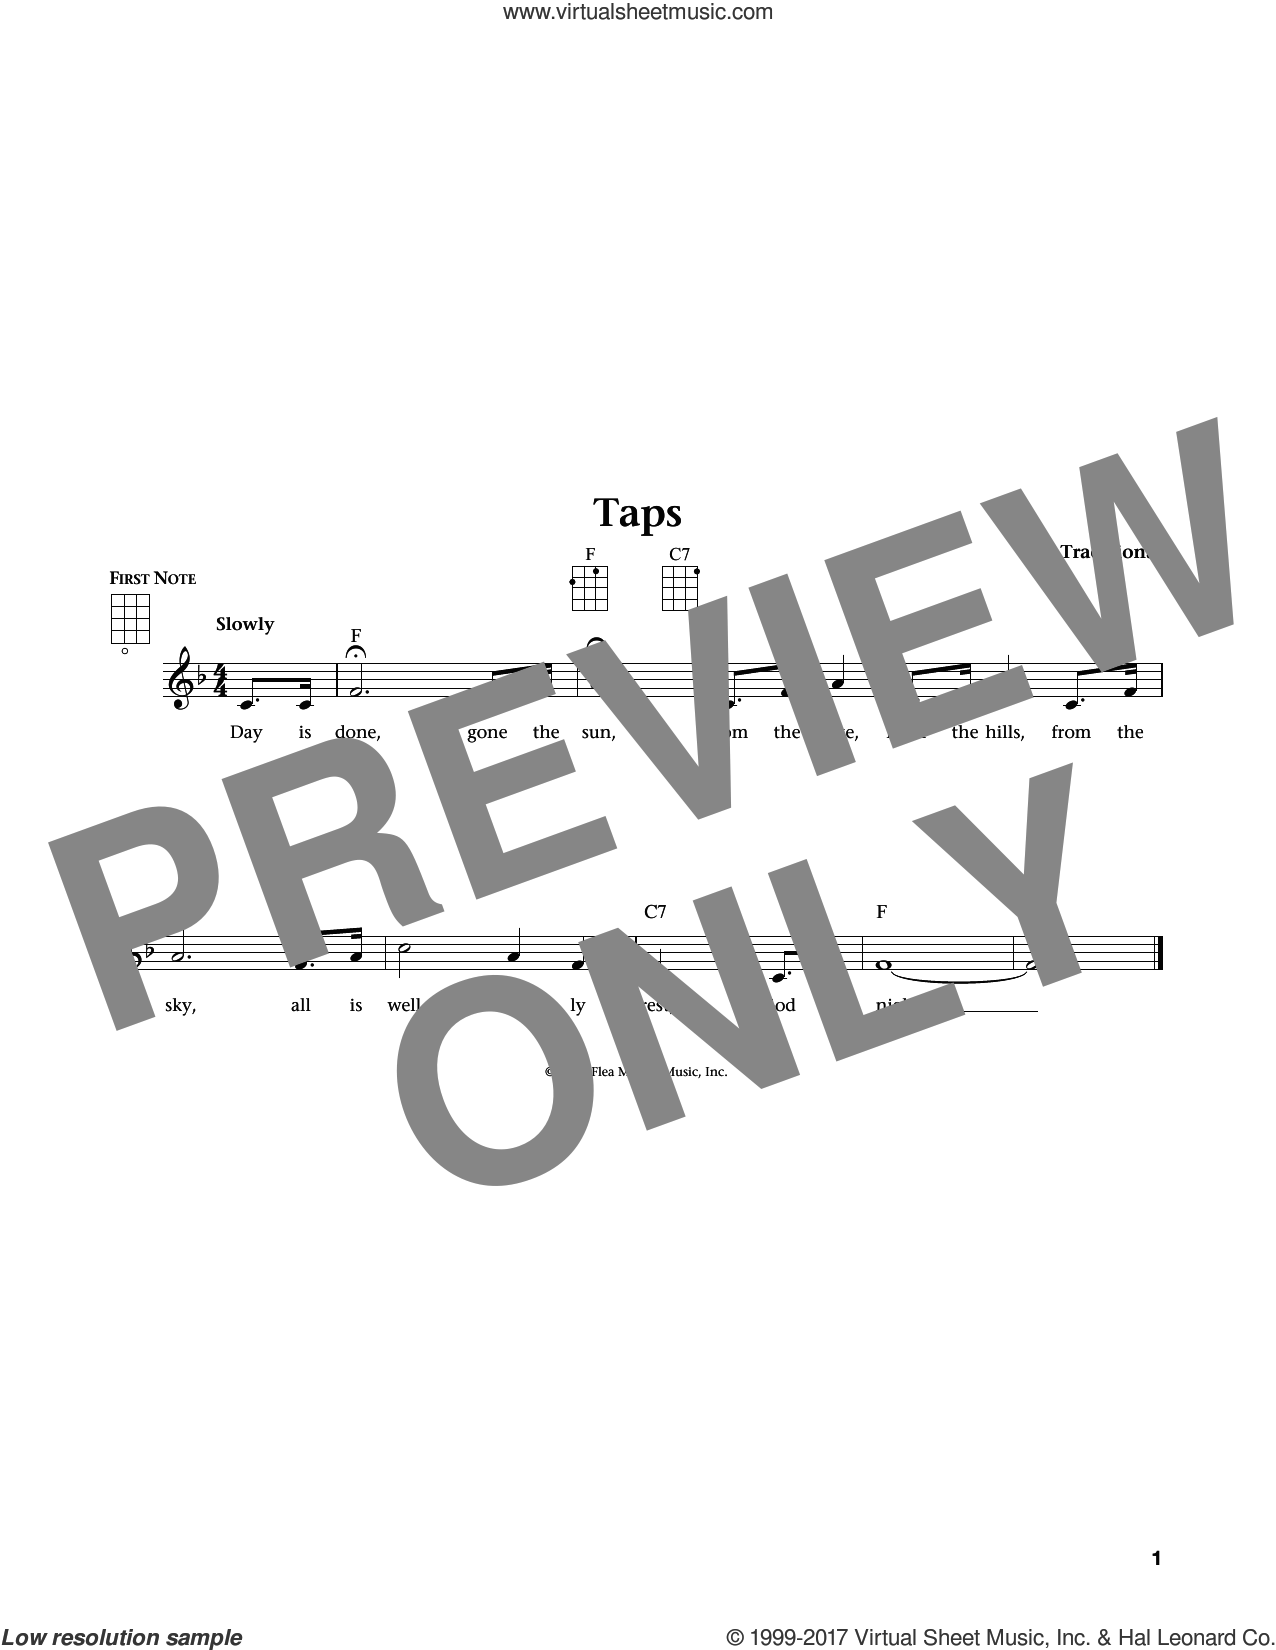 Taps (from The Daily Ukulele) (arr. Liz and Jim Beloff) sheet music for ukulele , Jim Beloff and Liz Beloff, intermediate skill level